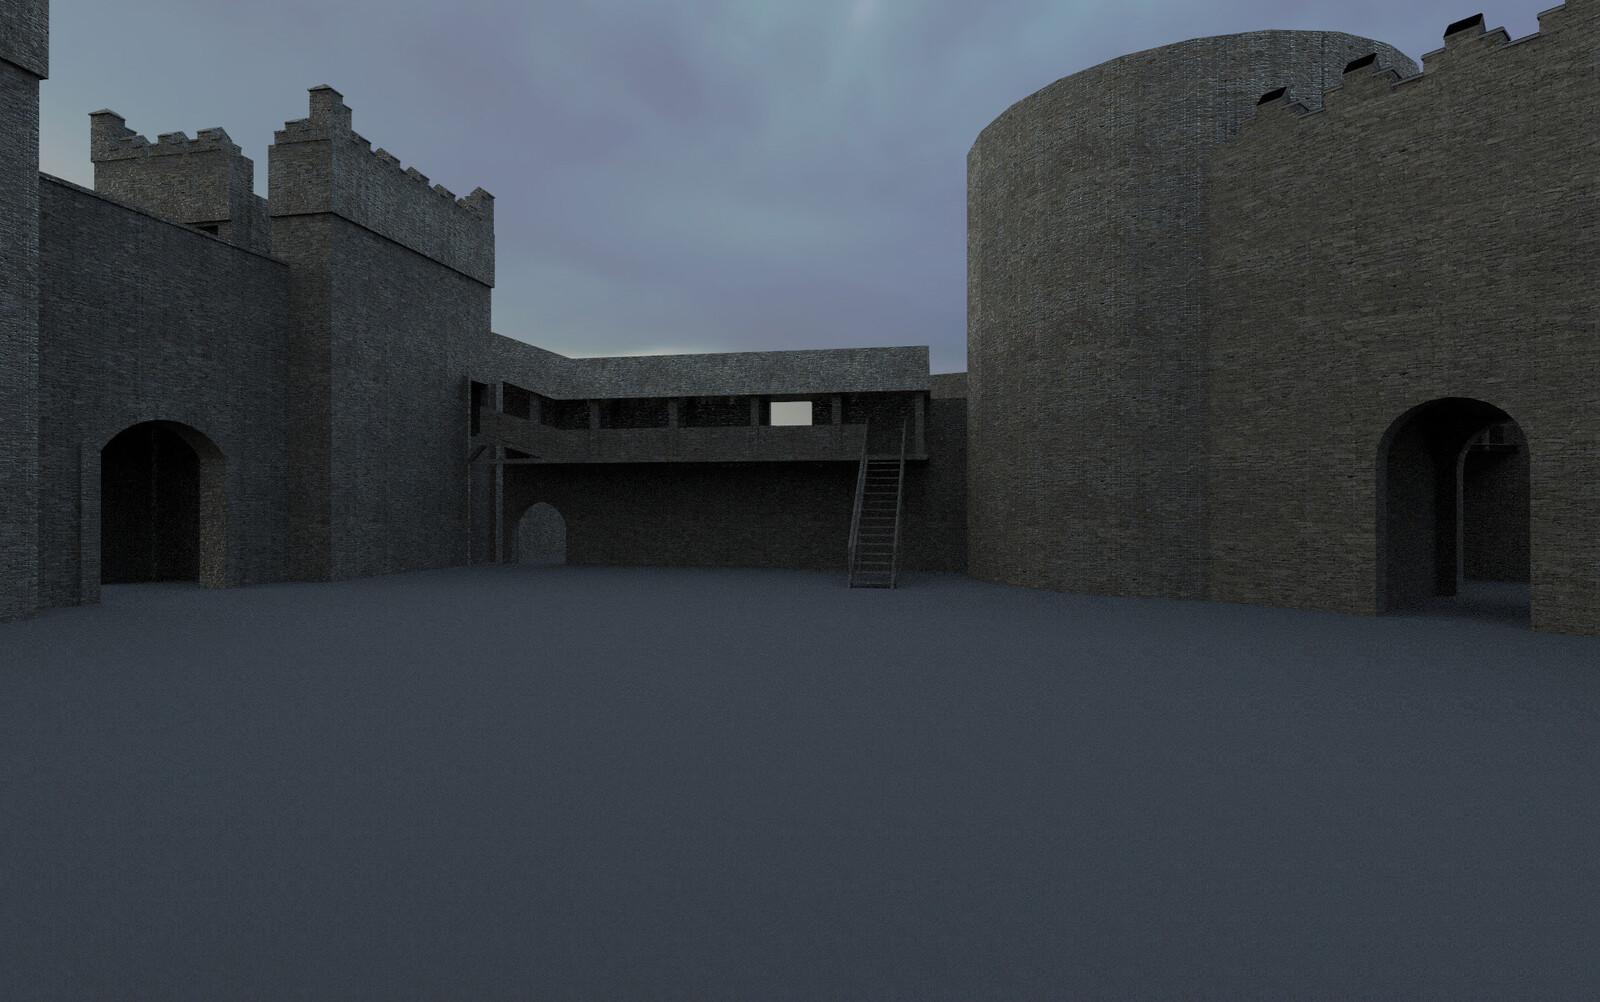 Render of castle geometry in Keyshot